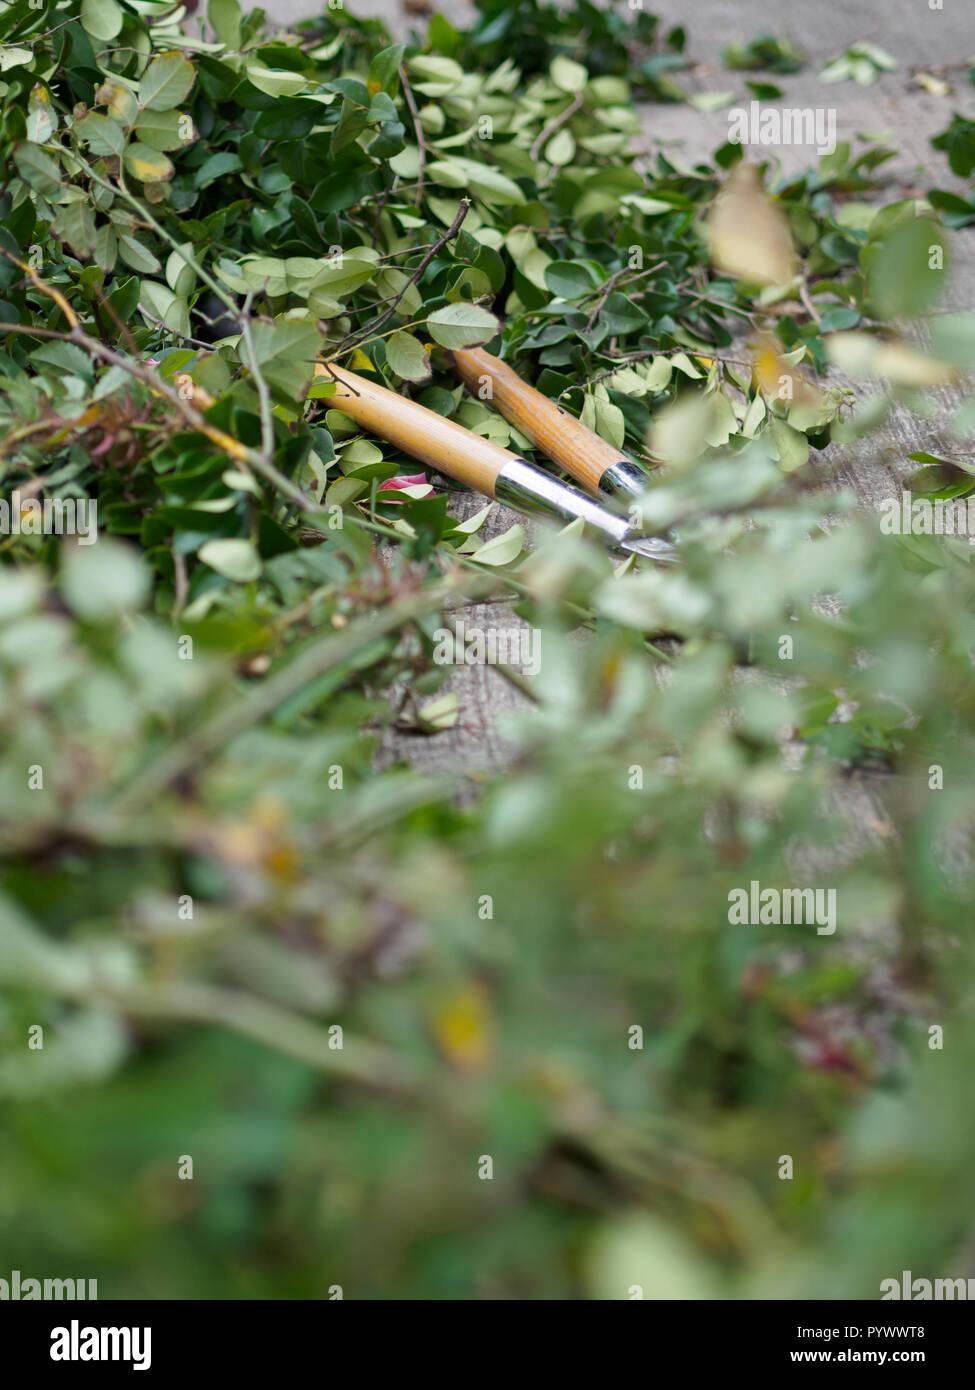 Yard lopper among bush clippings - Stock Image